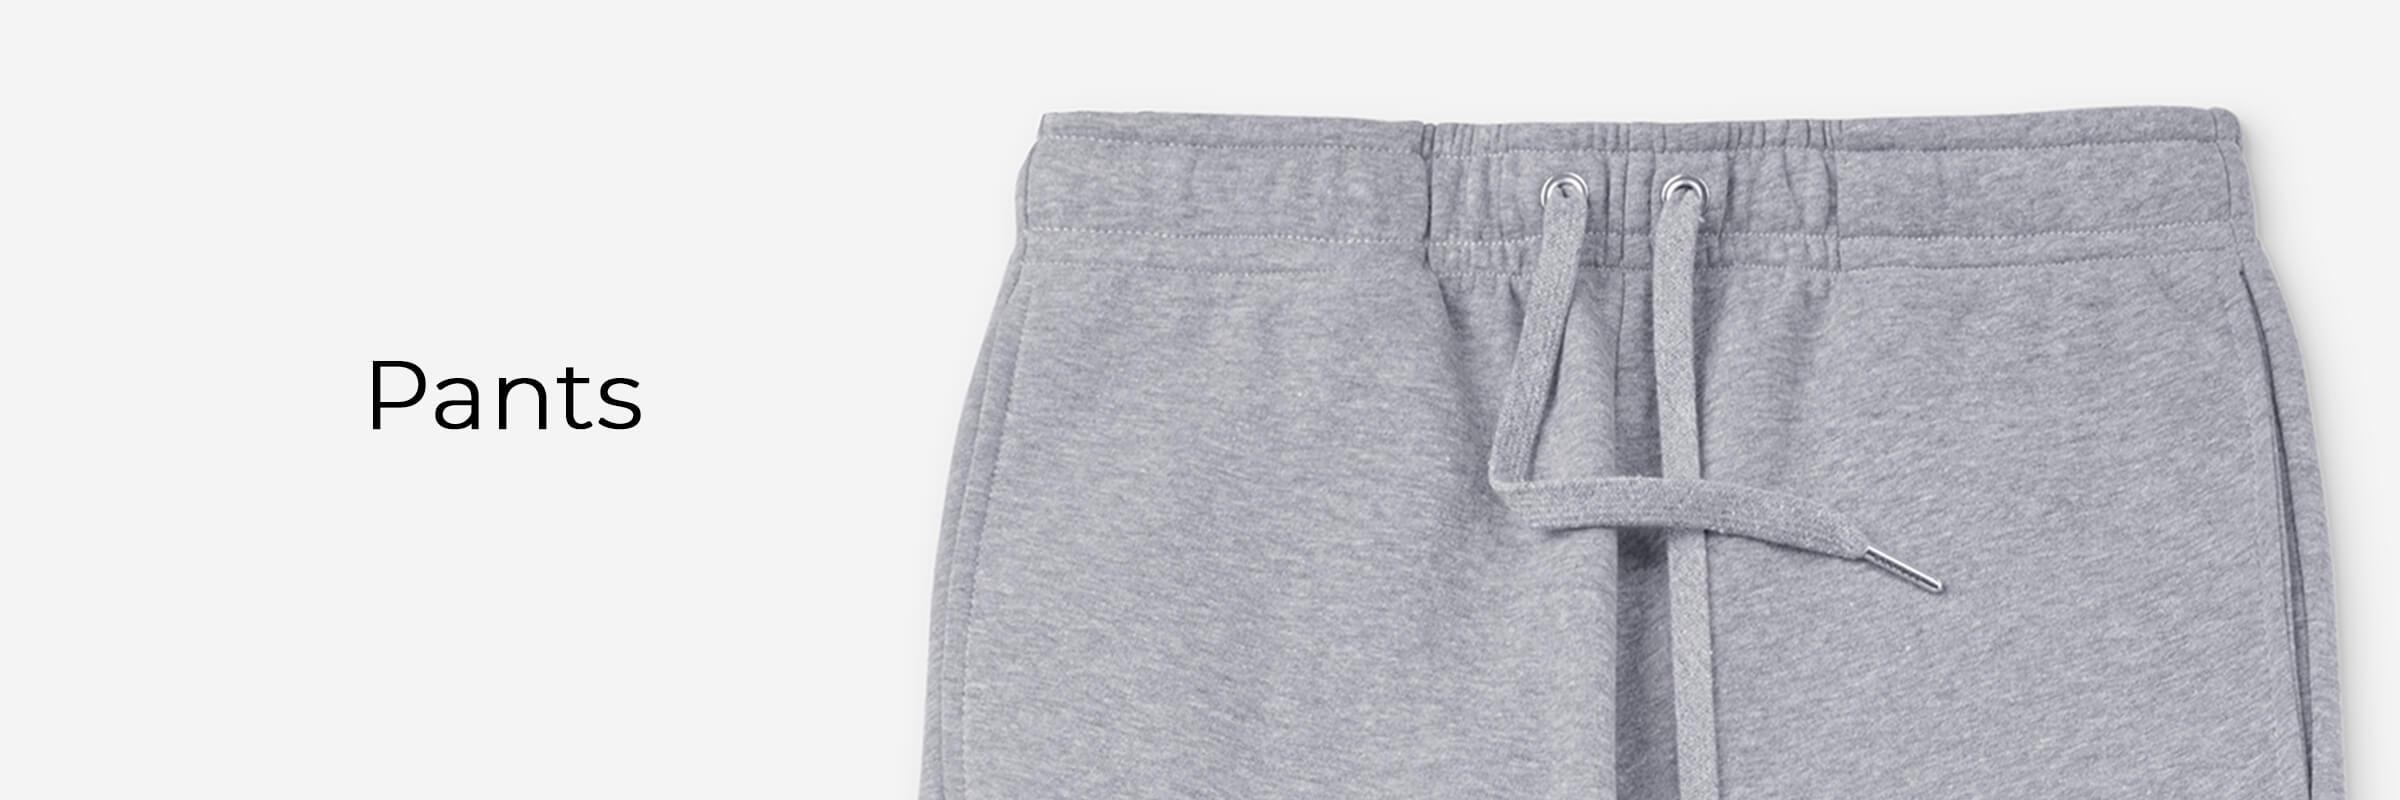 Pants mens collection baner